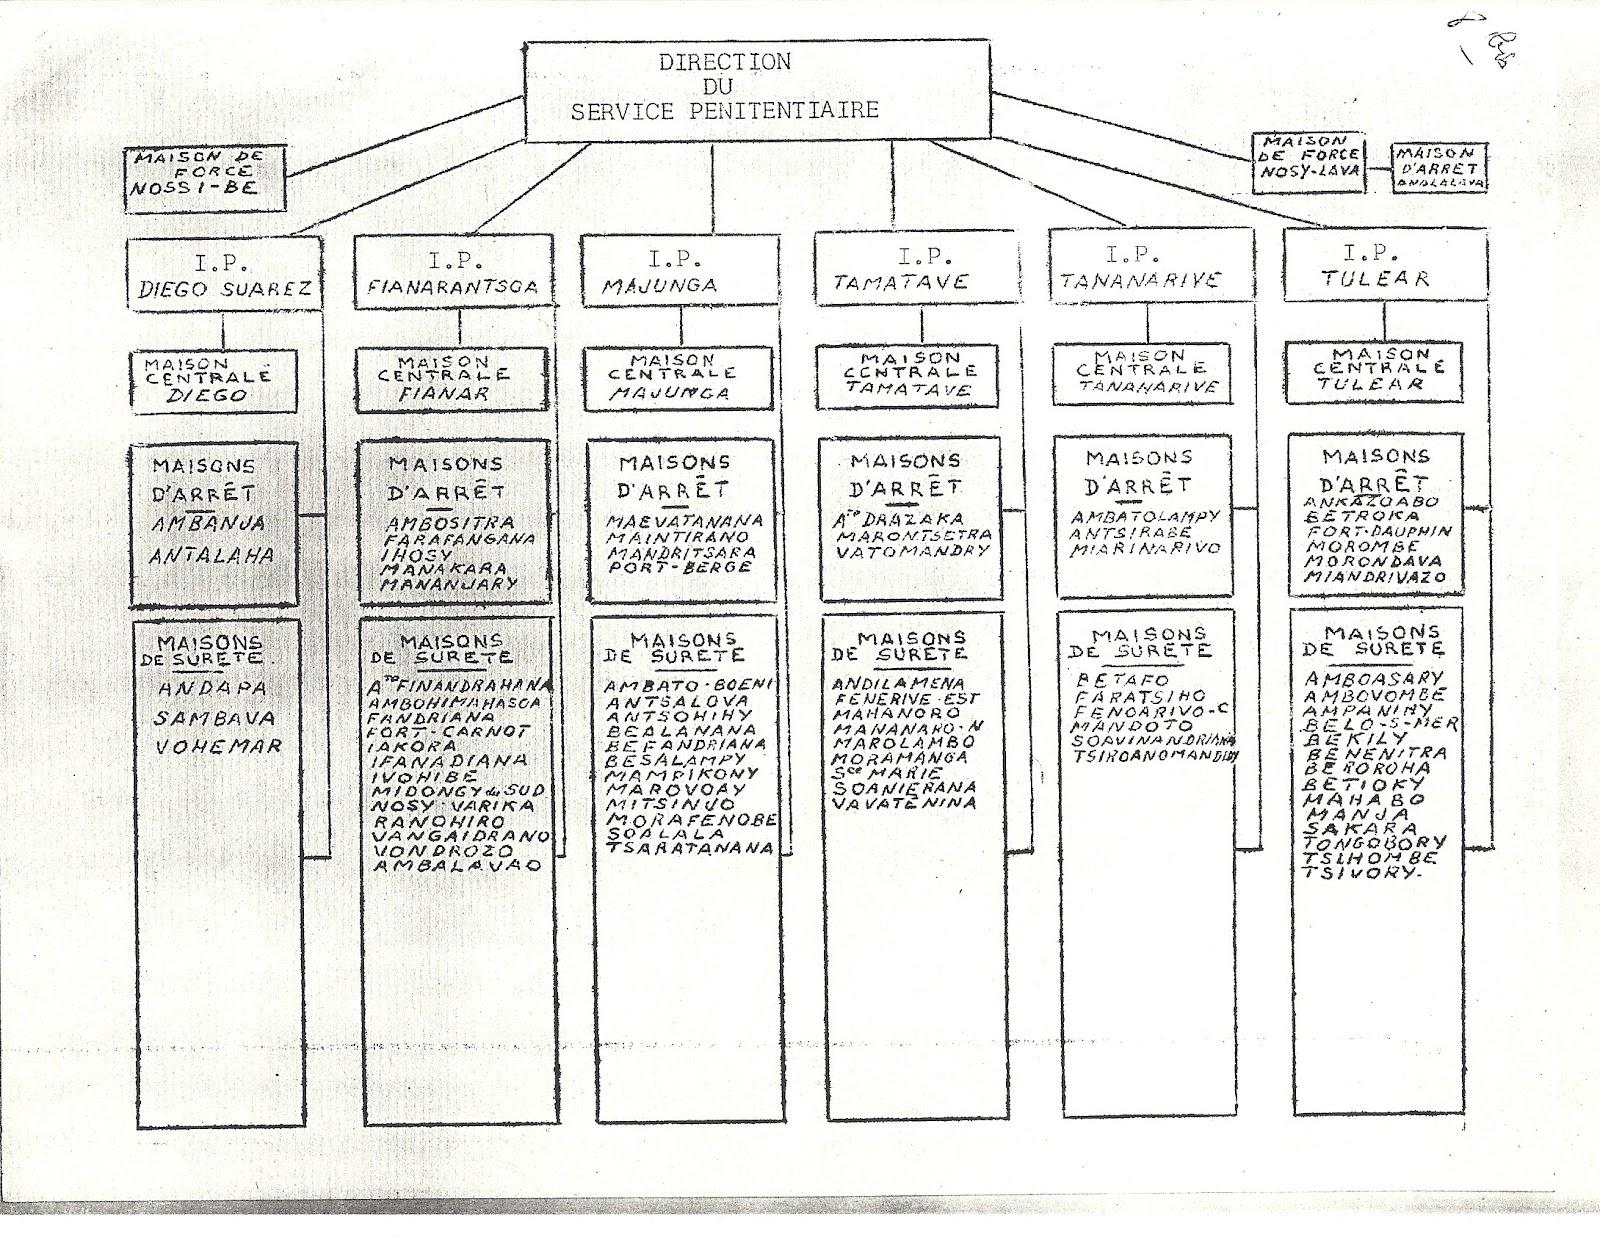 Prisons madagascar 1959 1960 - Porte carte administration penitentiaire ...